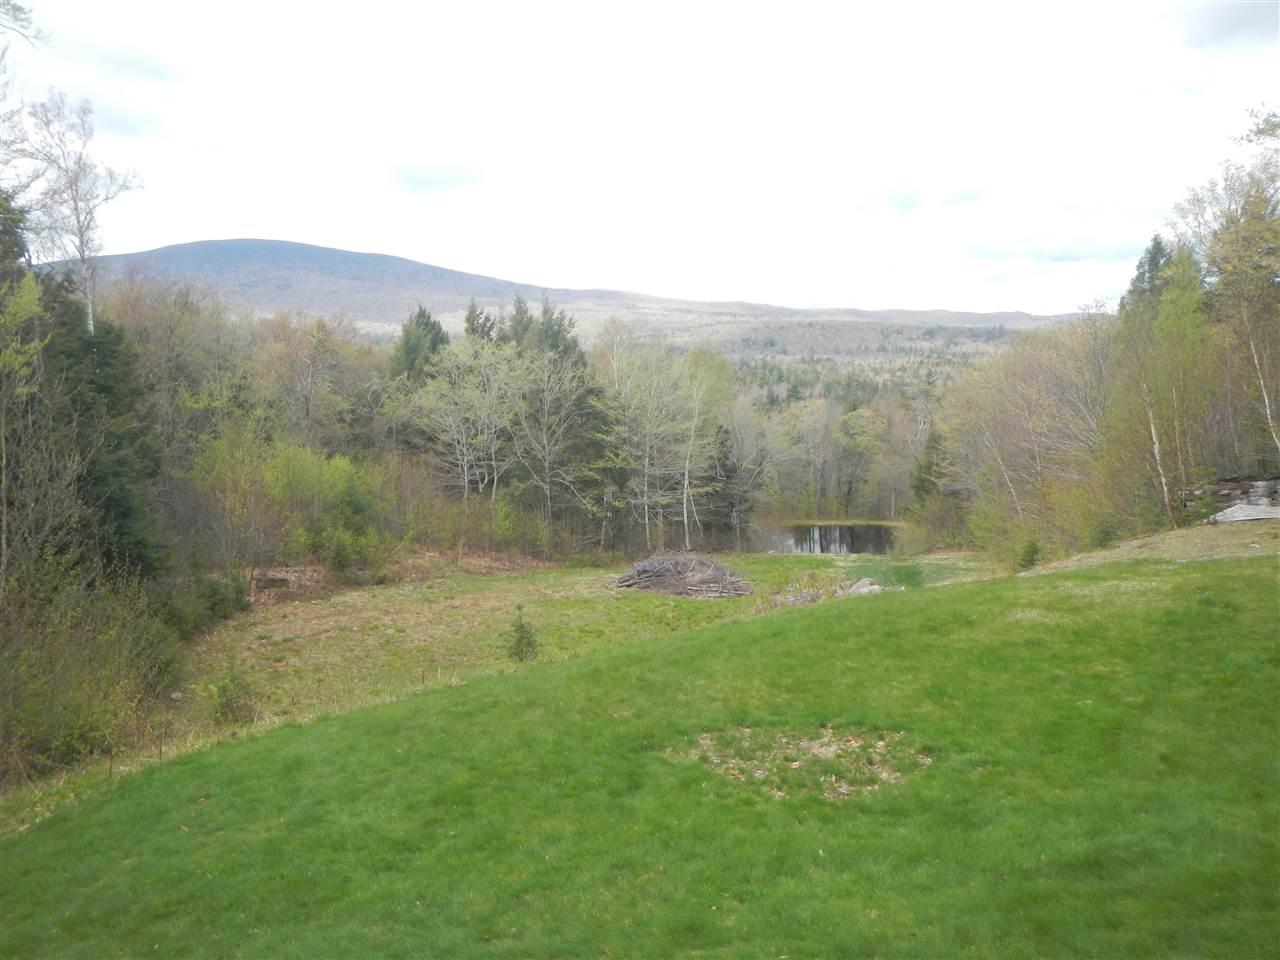 Mount-Snow-Real-Estate-4633923-16